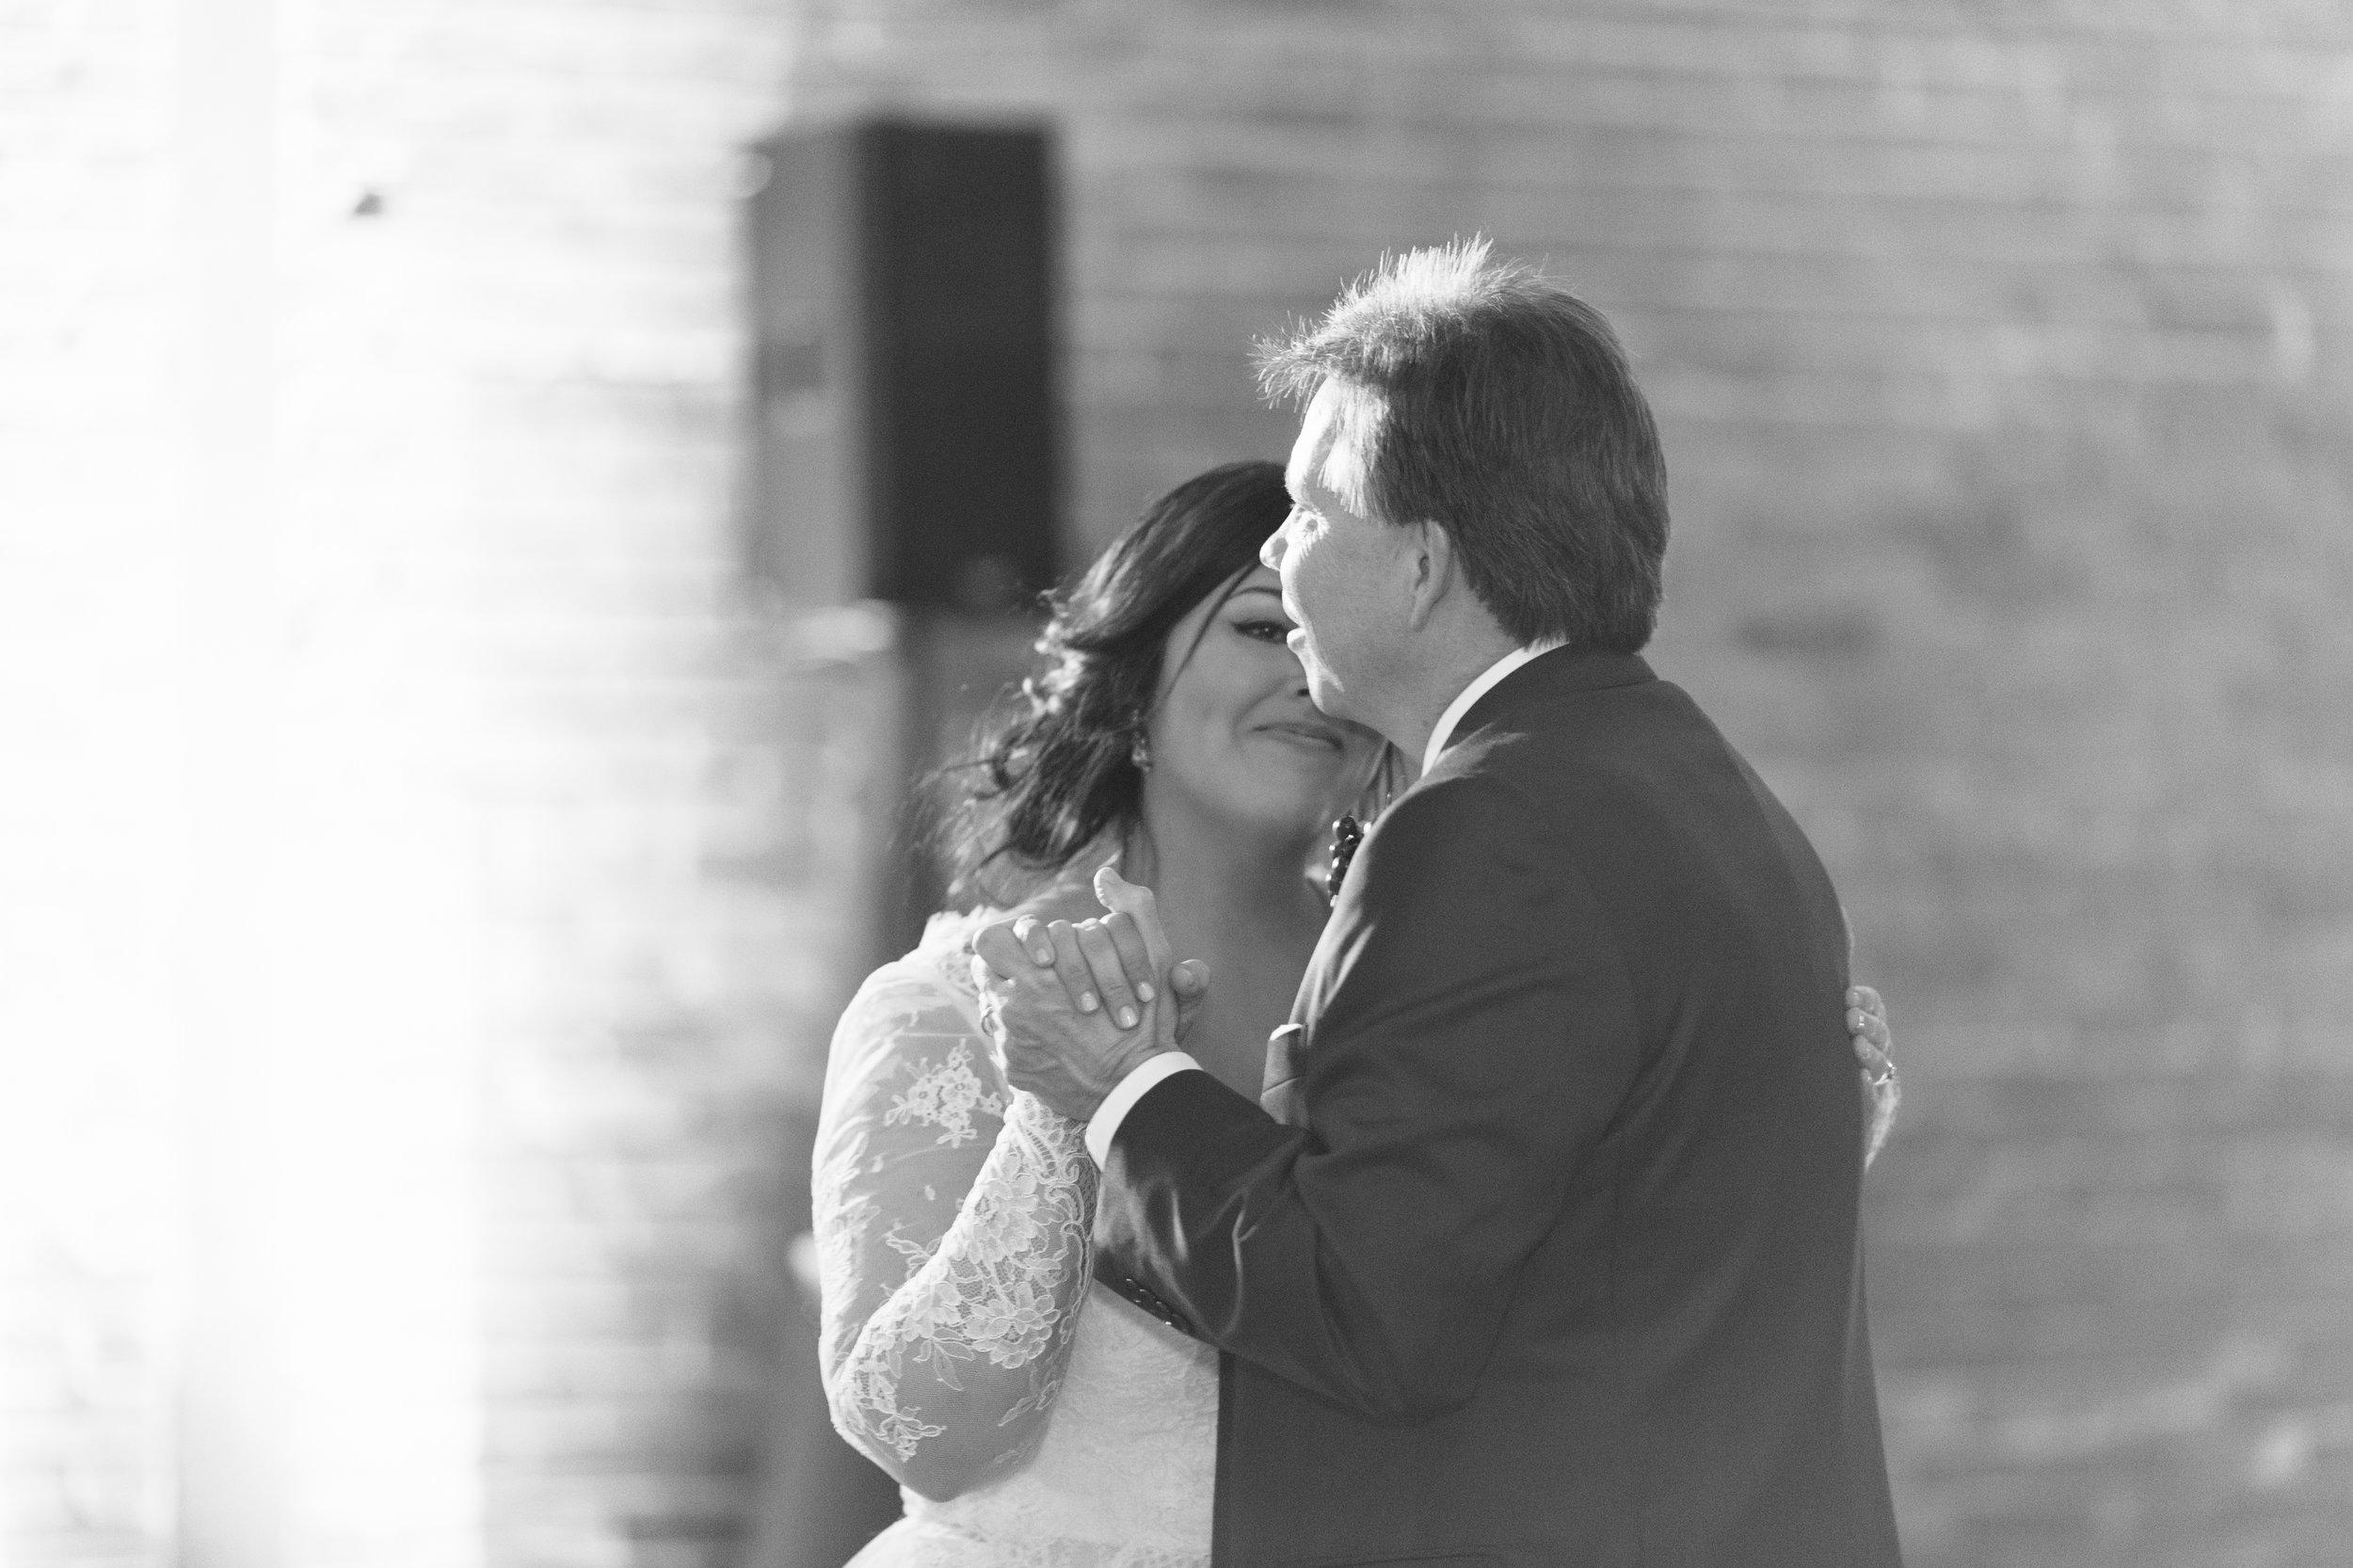 Lauren_Jeremy_Standard_Wedding_Knoxville_Abigail_Malone_Photography_FIlm-545.jpg